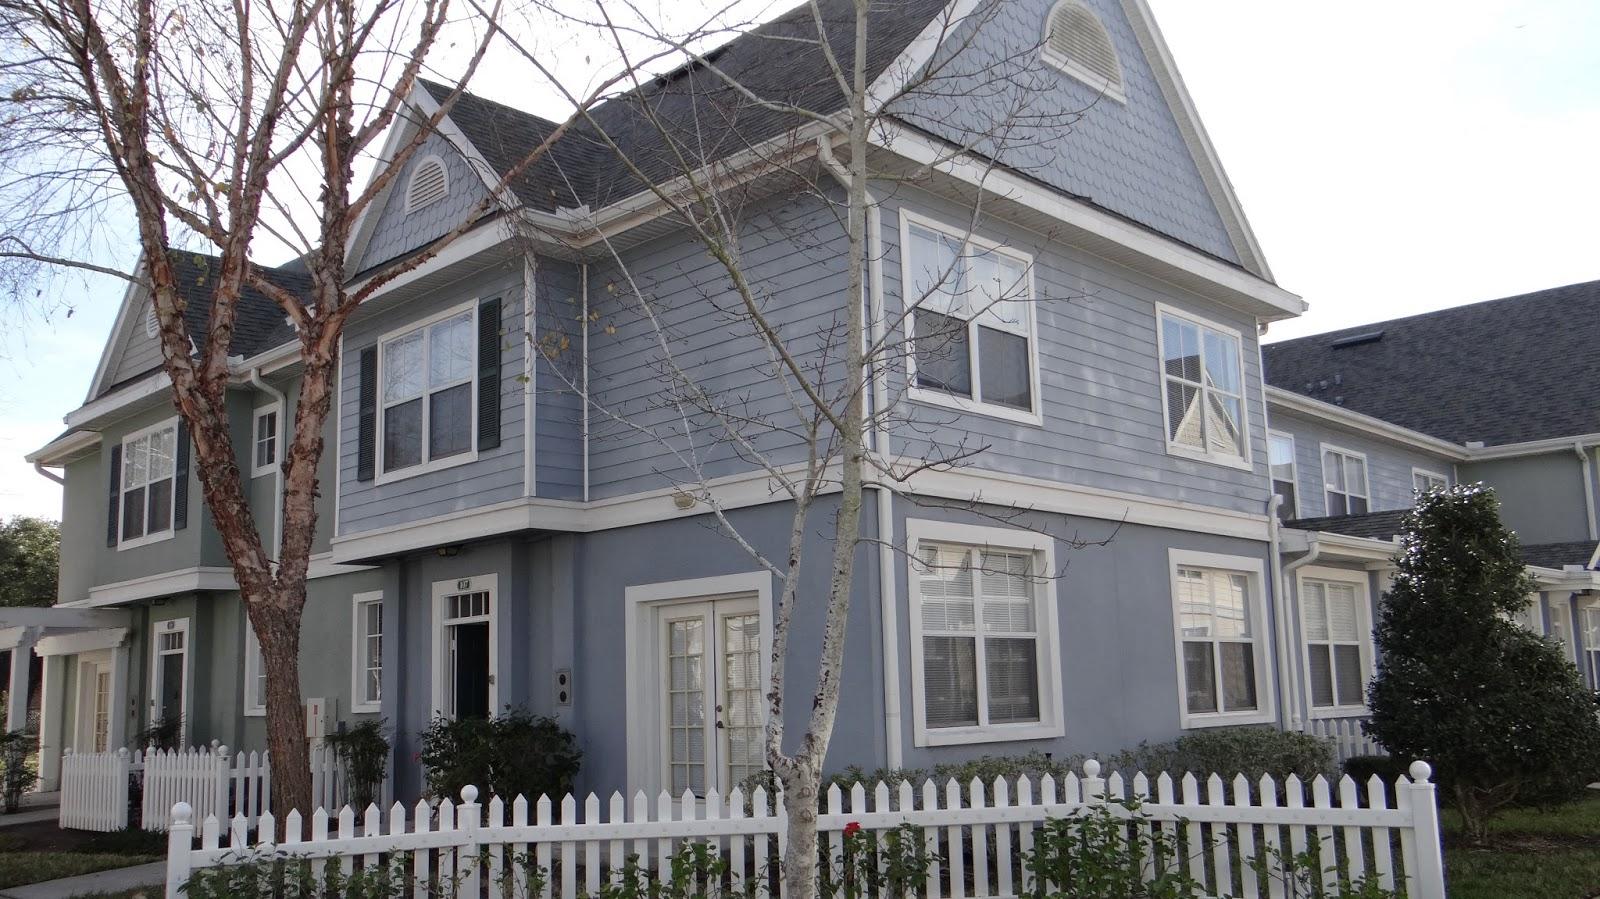 Disney f cil e barato casa barata para alugar em orlando for Apartamentos baratos en sevilla por dias